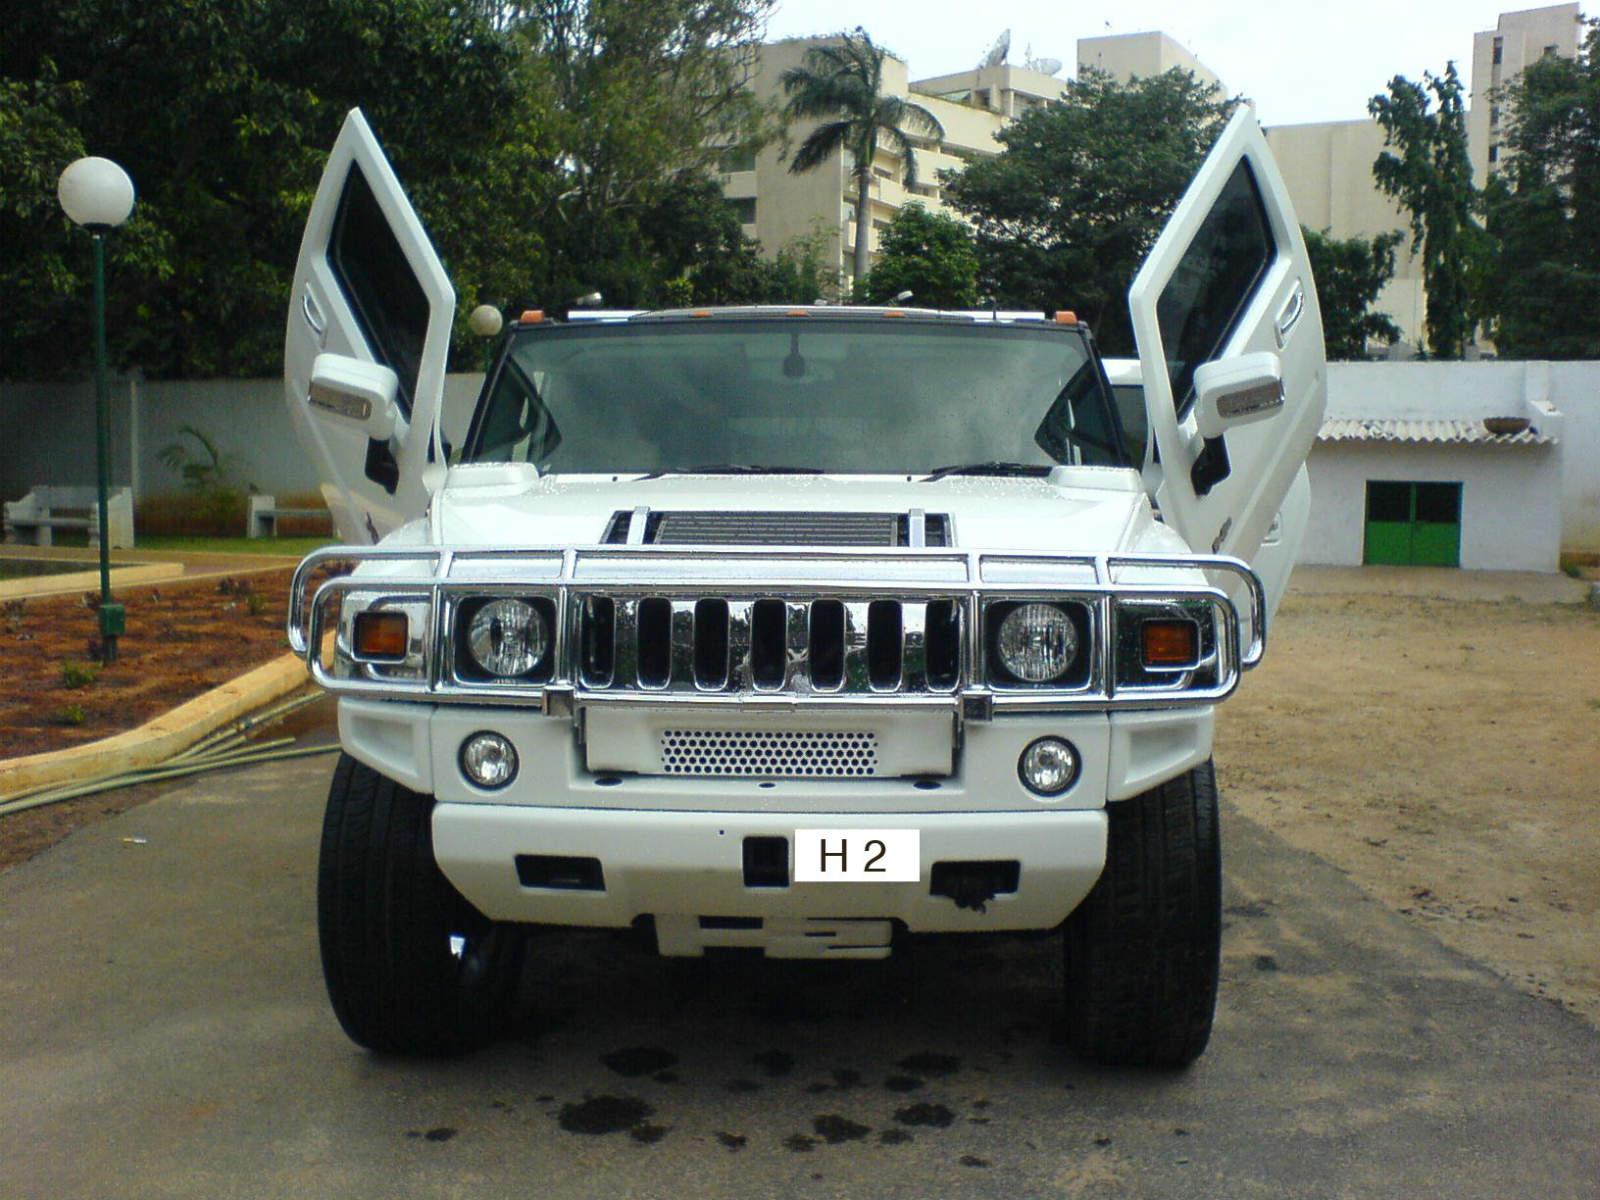 White Siccor Doors Hummer Front View NO Car NO Fun Muscle Cars